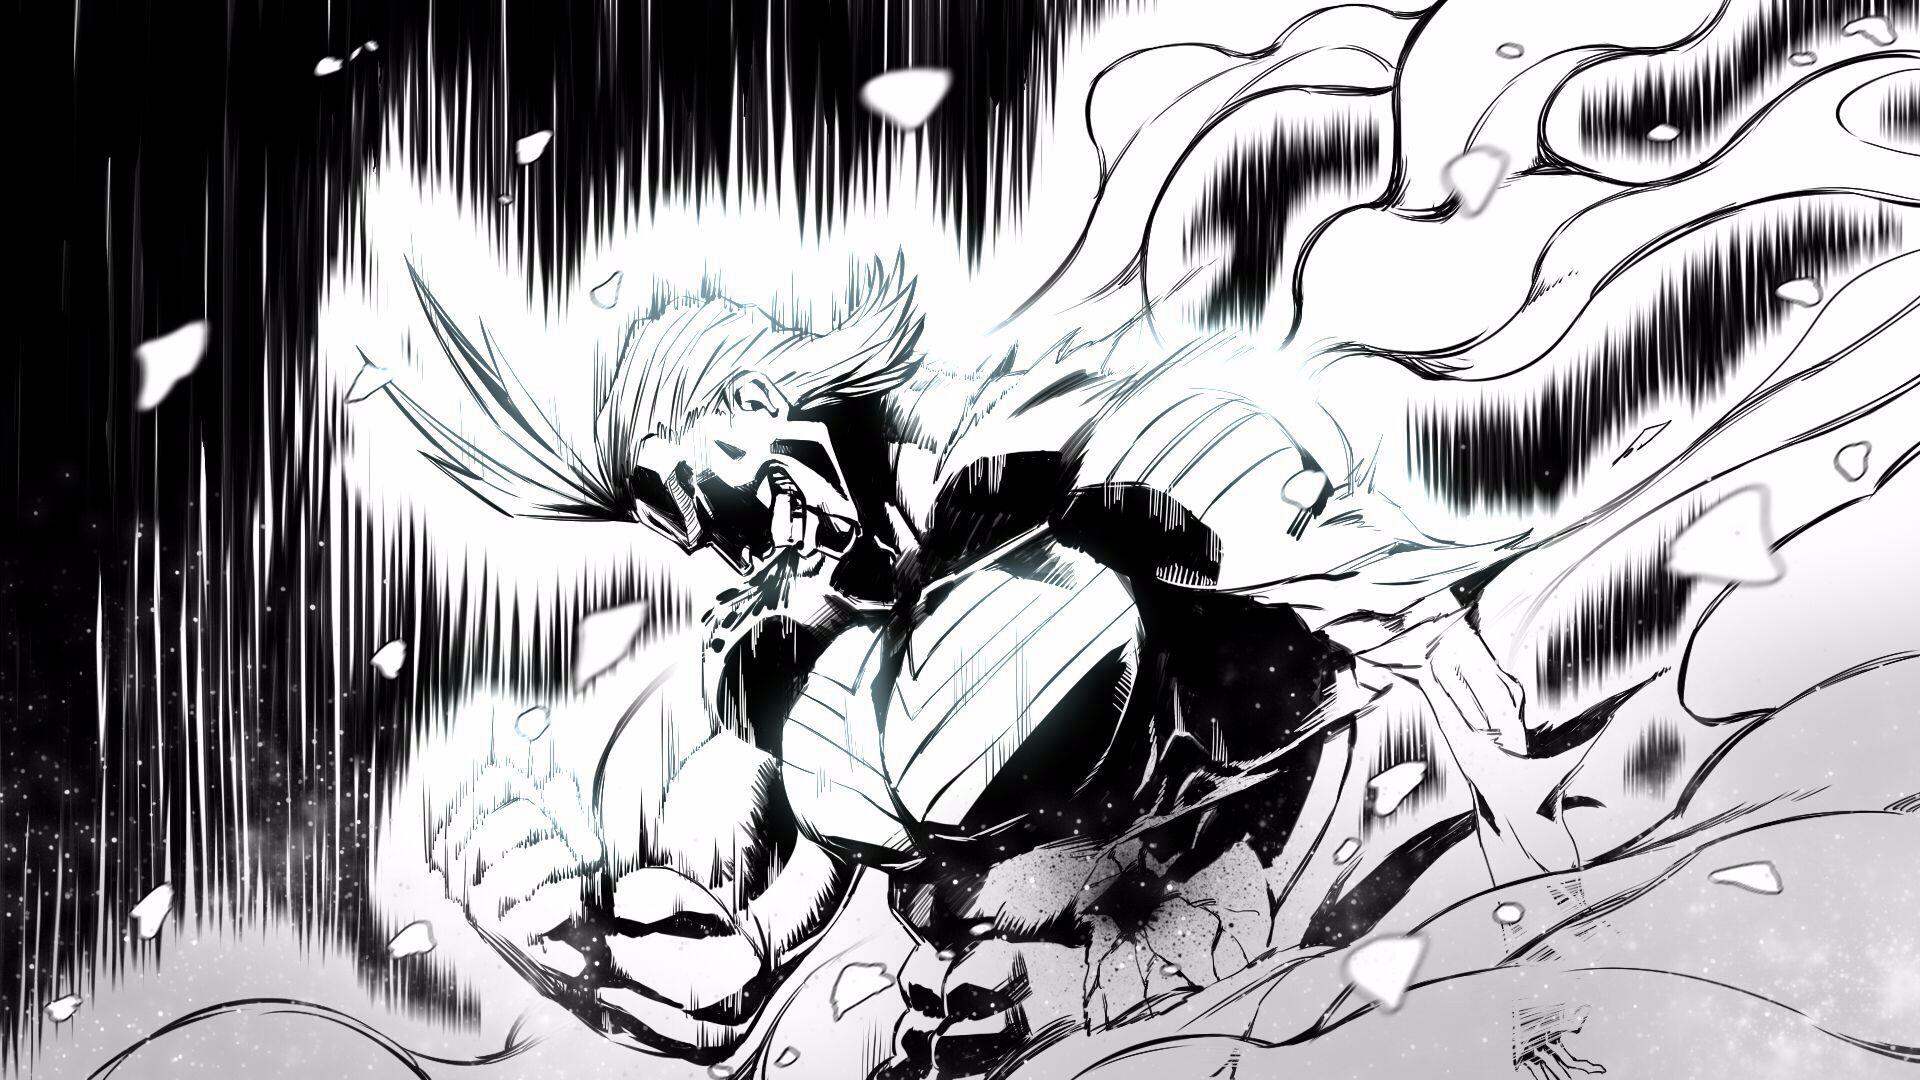 Wallpaper Boku No Hero Academia Anime Men Digital Art